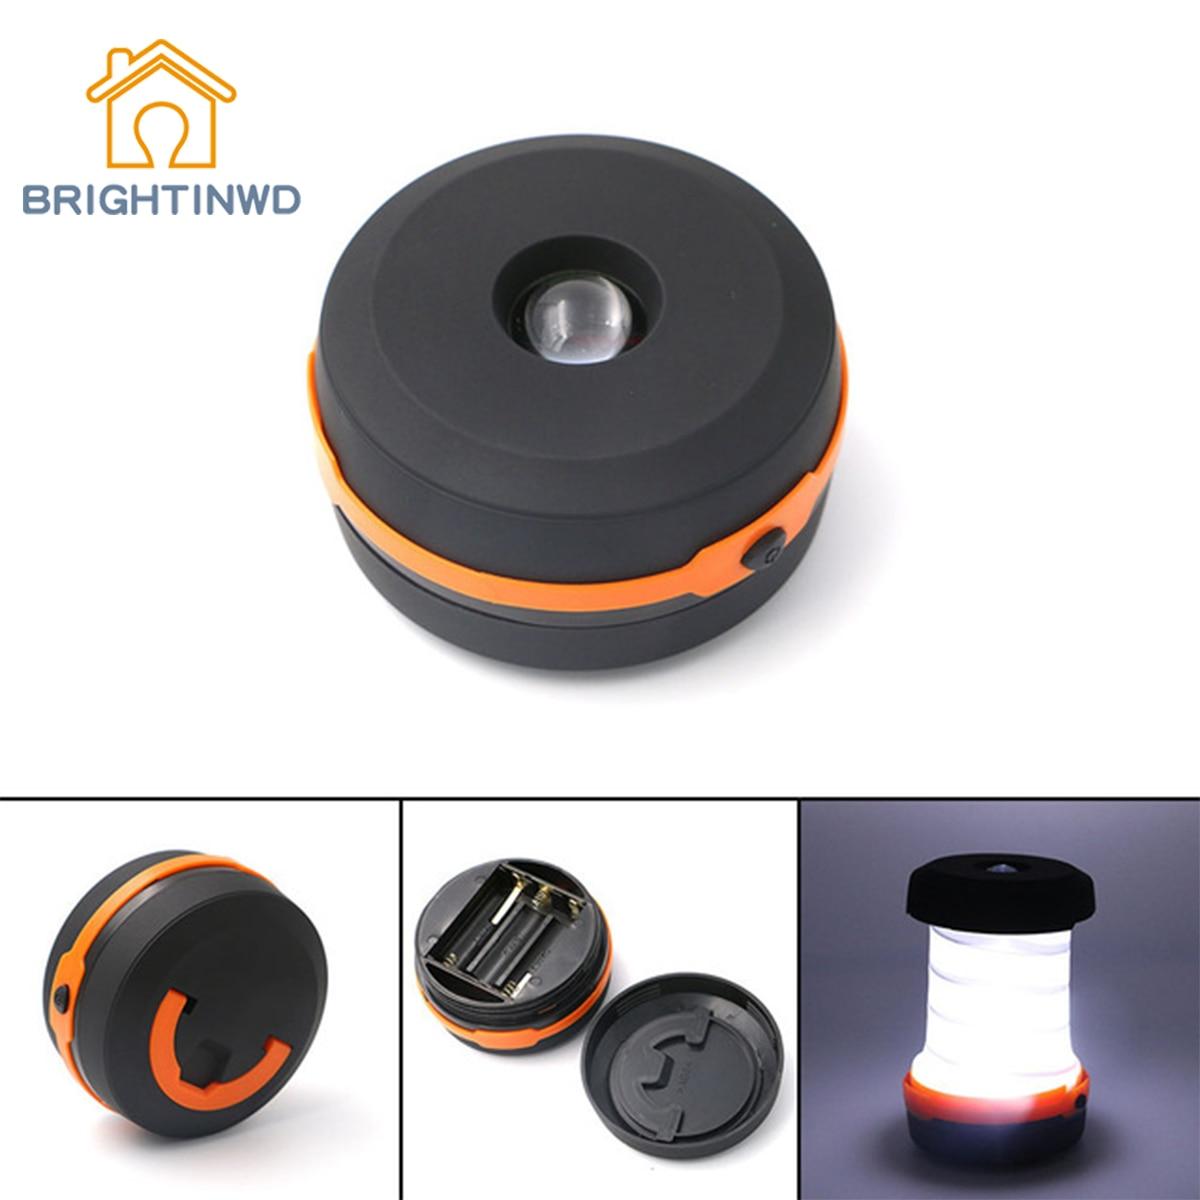 LED Flashlight Outdoor Portable Lantern Mini Tent Light Emergency Lamp Pocket Torch Multifunction Retractable Camping Lights